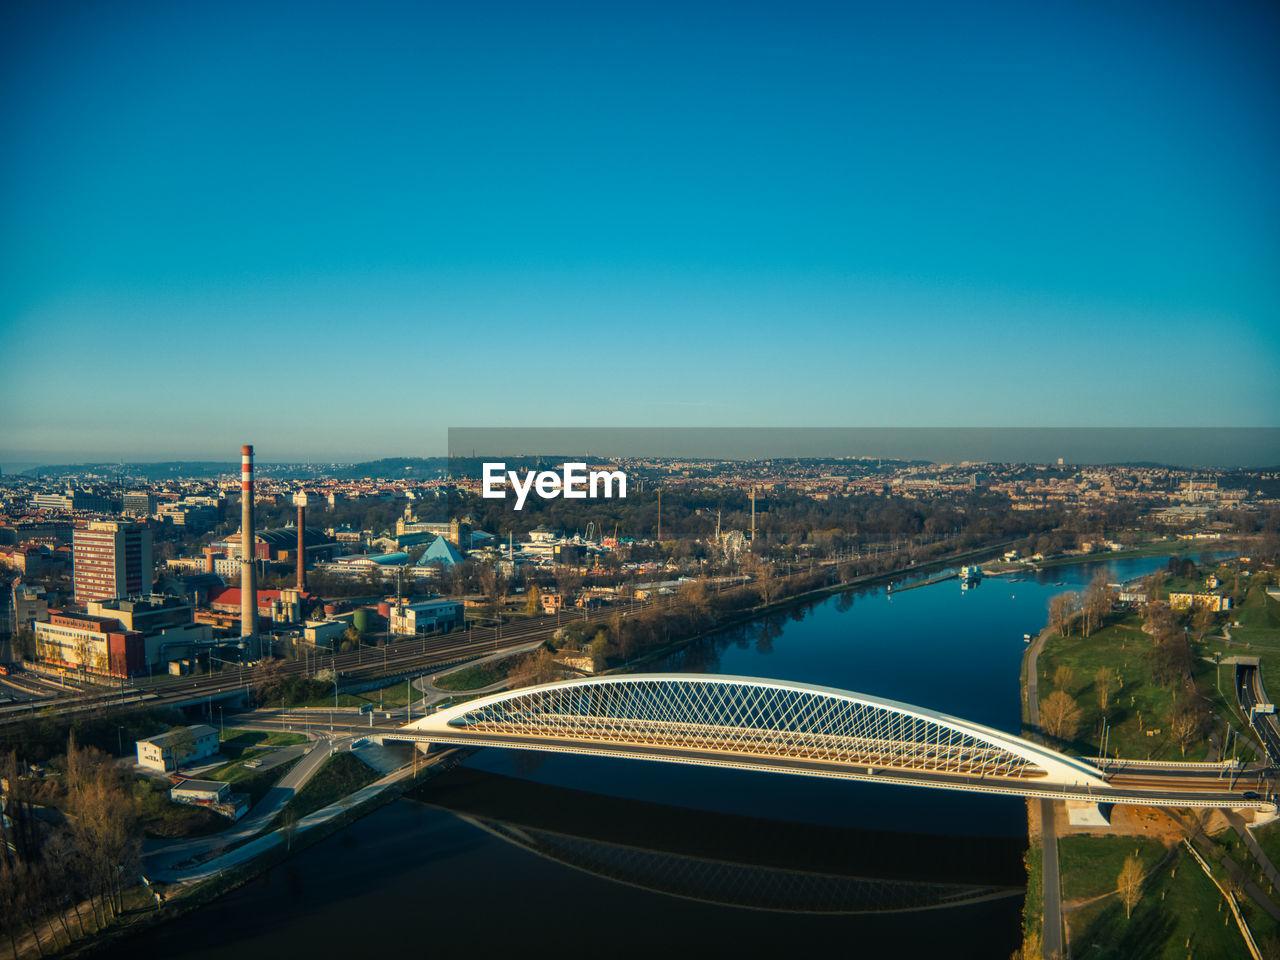 Futuristic troja bridge in holesovice prague